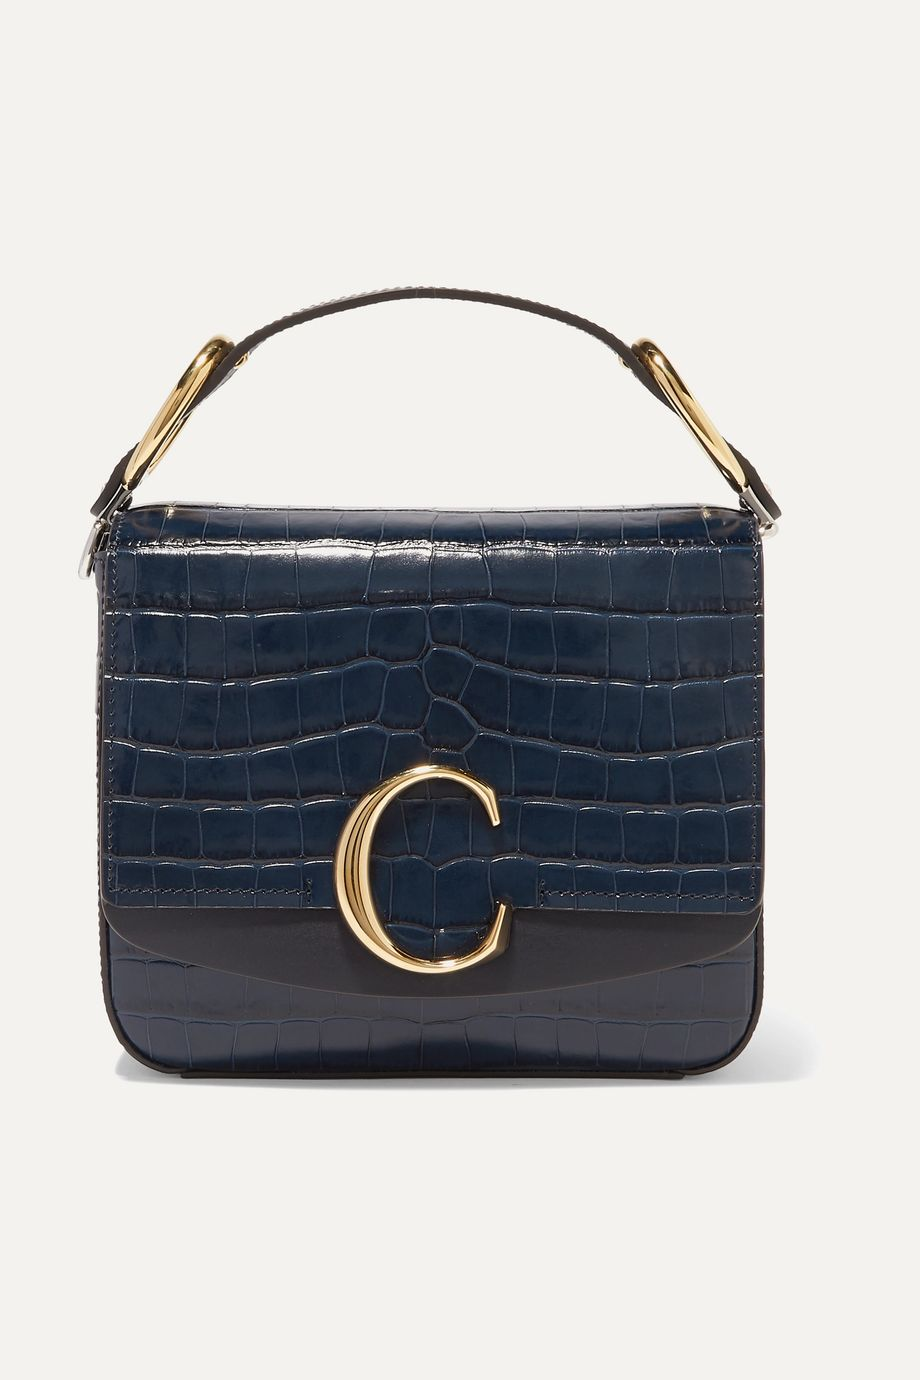 Chloé Chloé C small leather-trimmed croc-effect shoulder bag